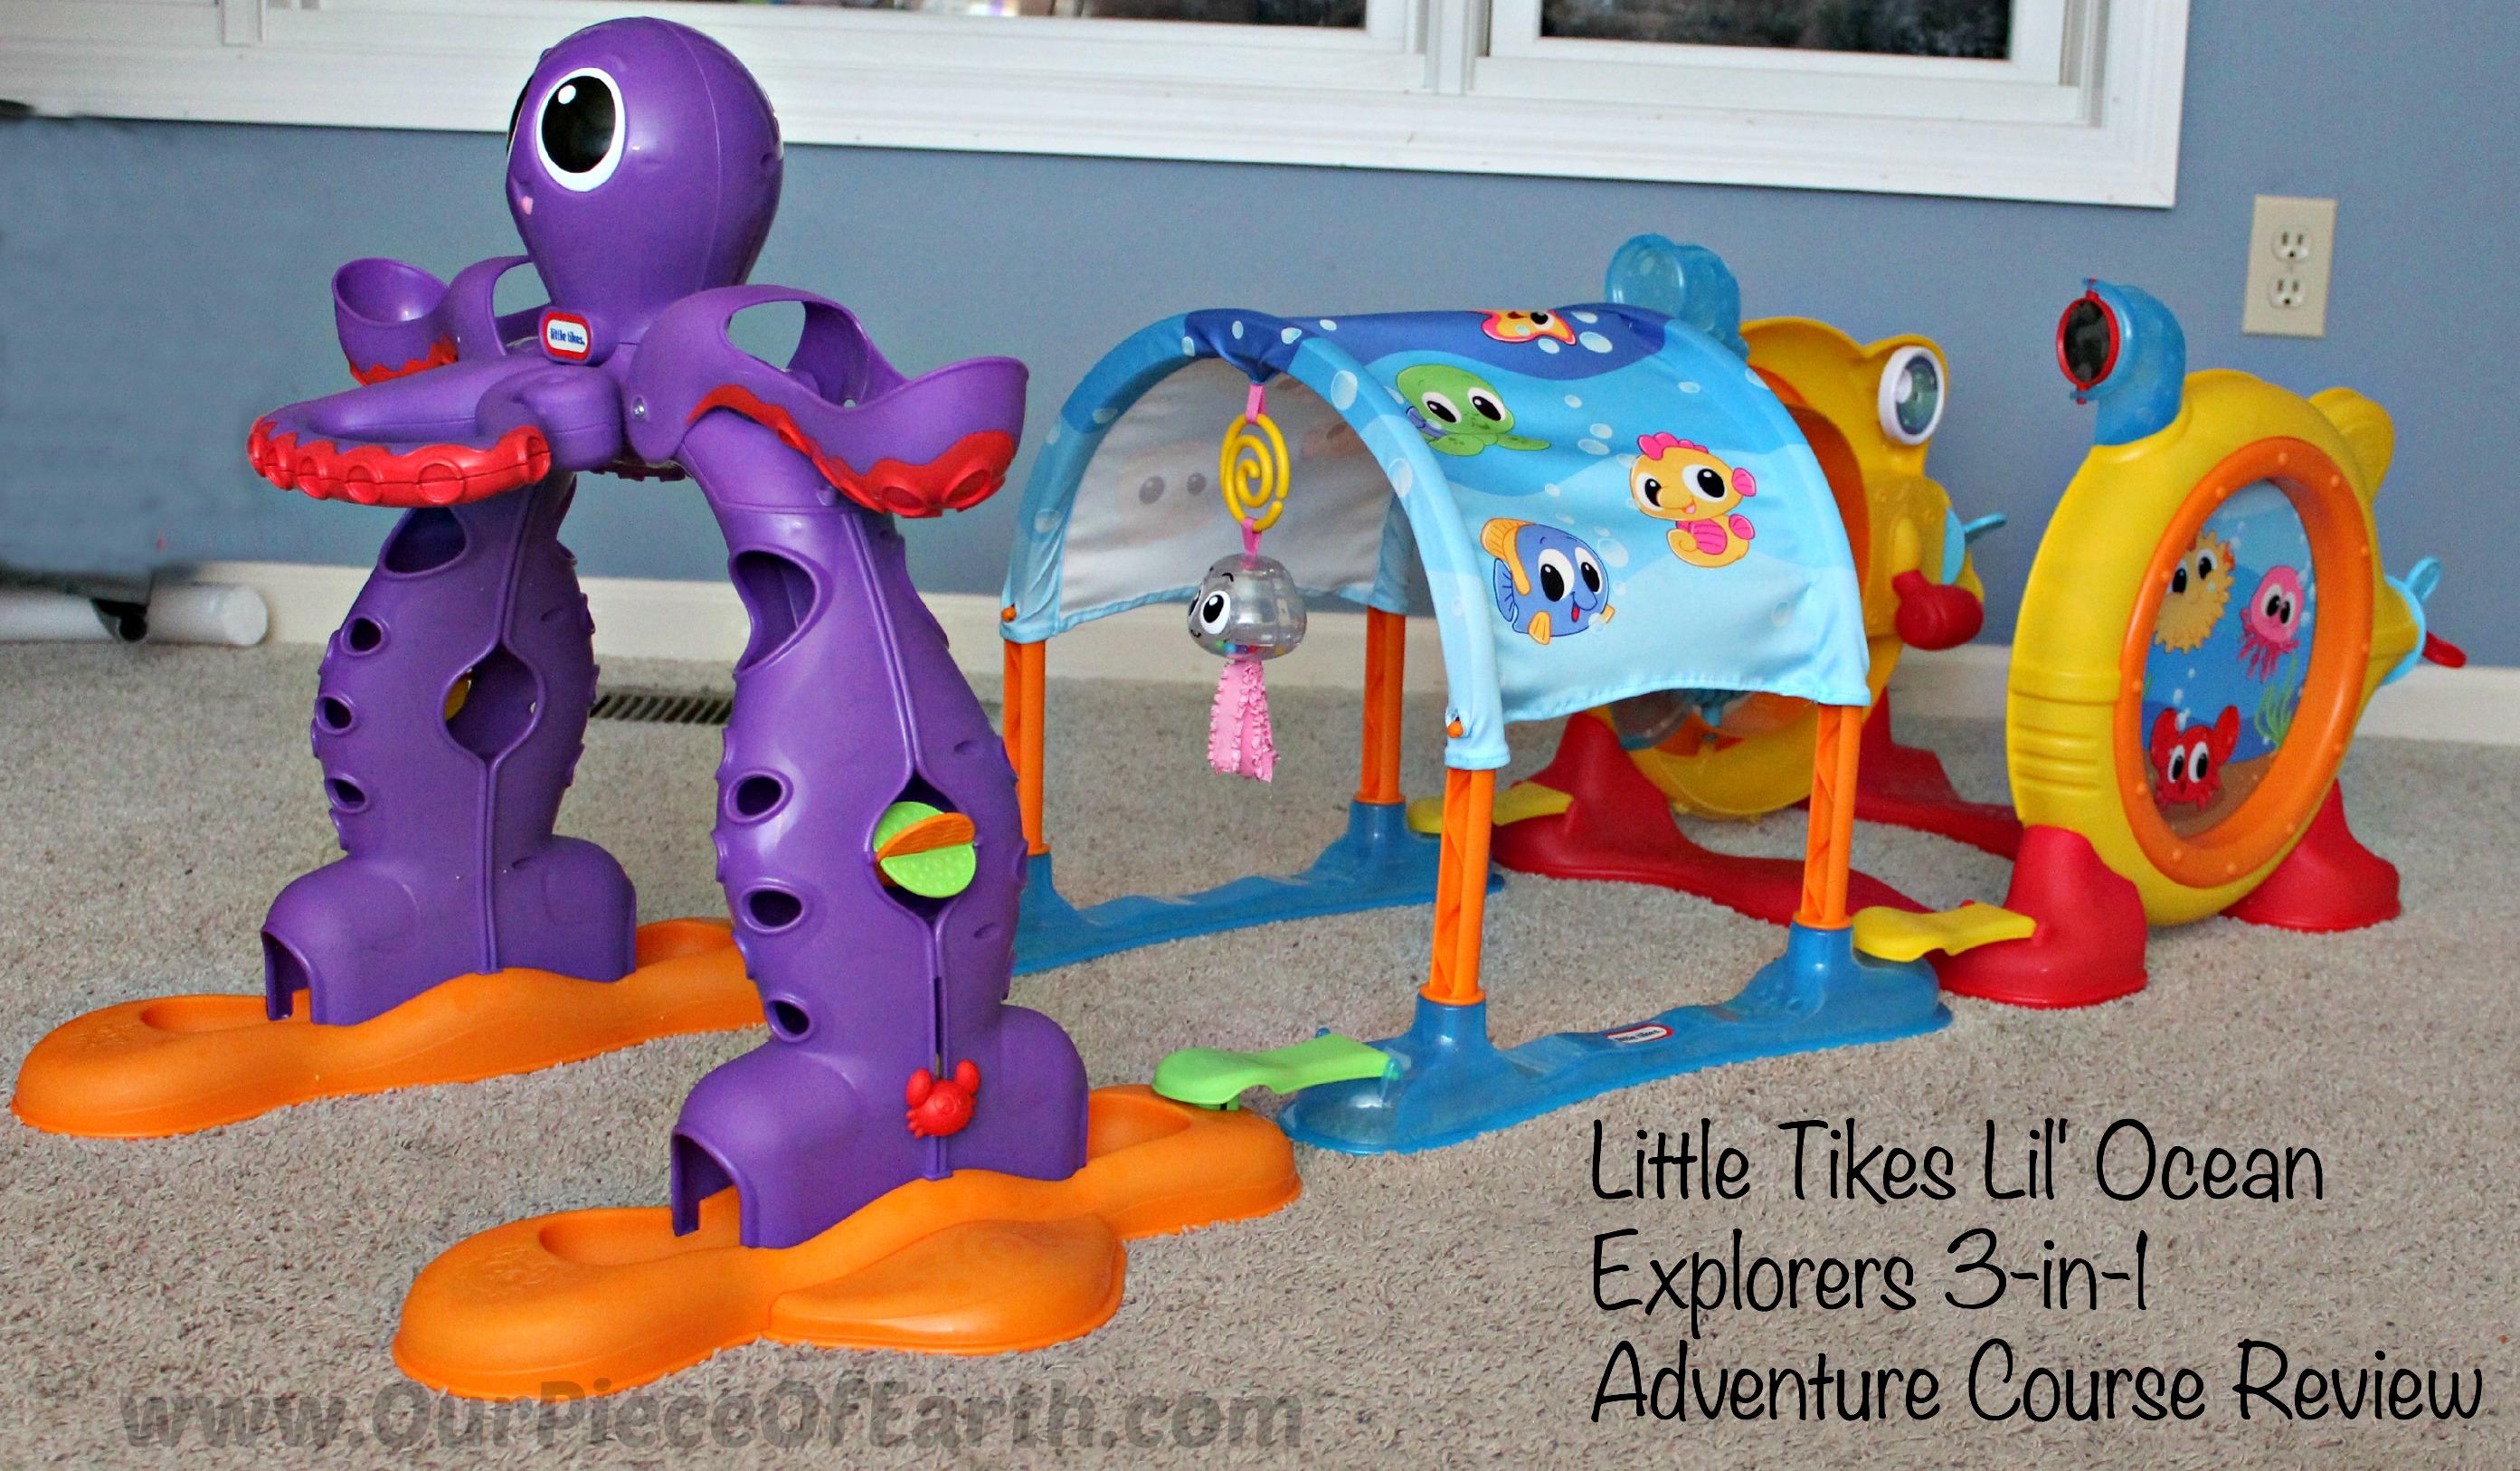 Little Tikes Lil' Ocean Explorers 3-in-1 Adventure Course